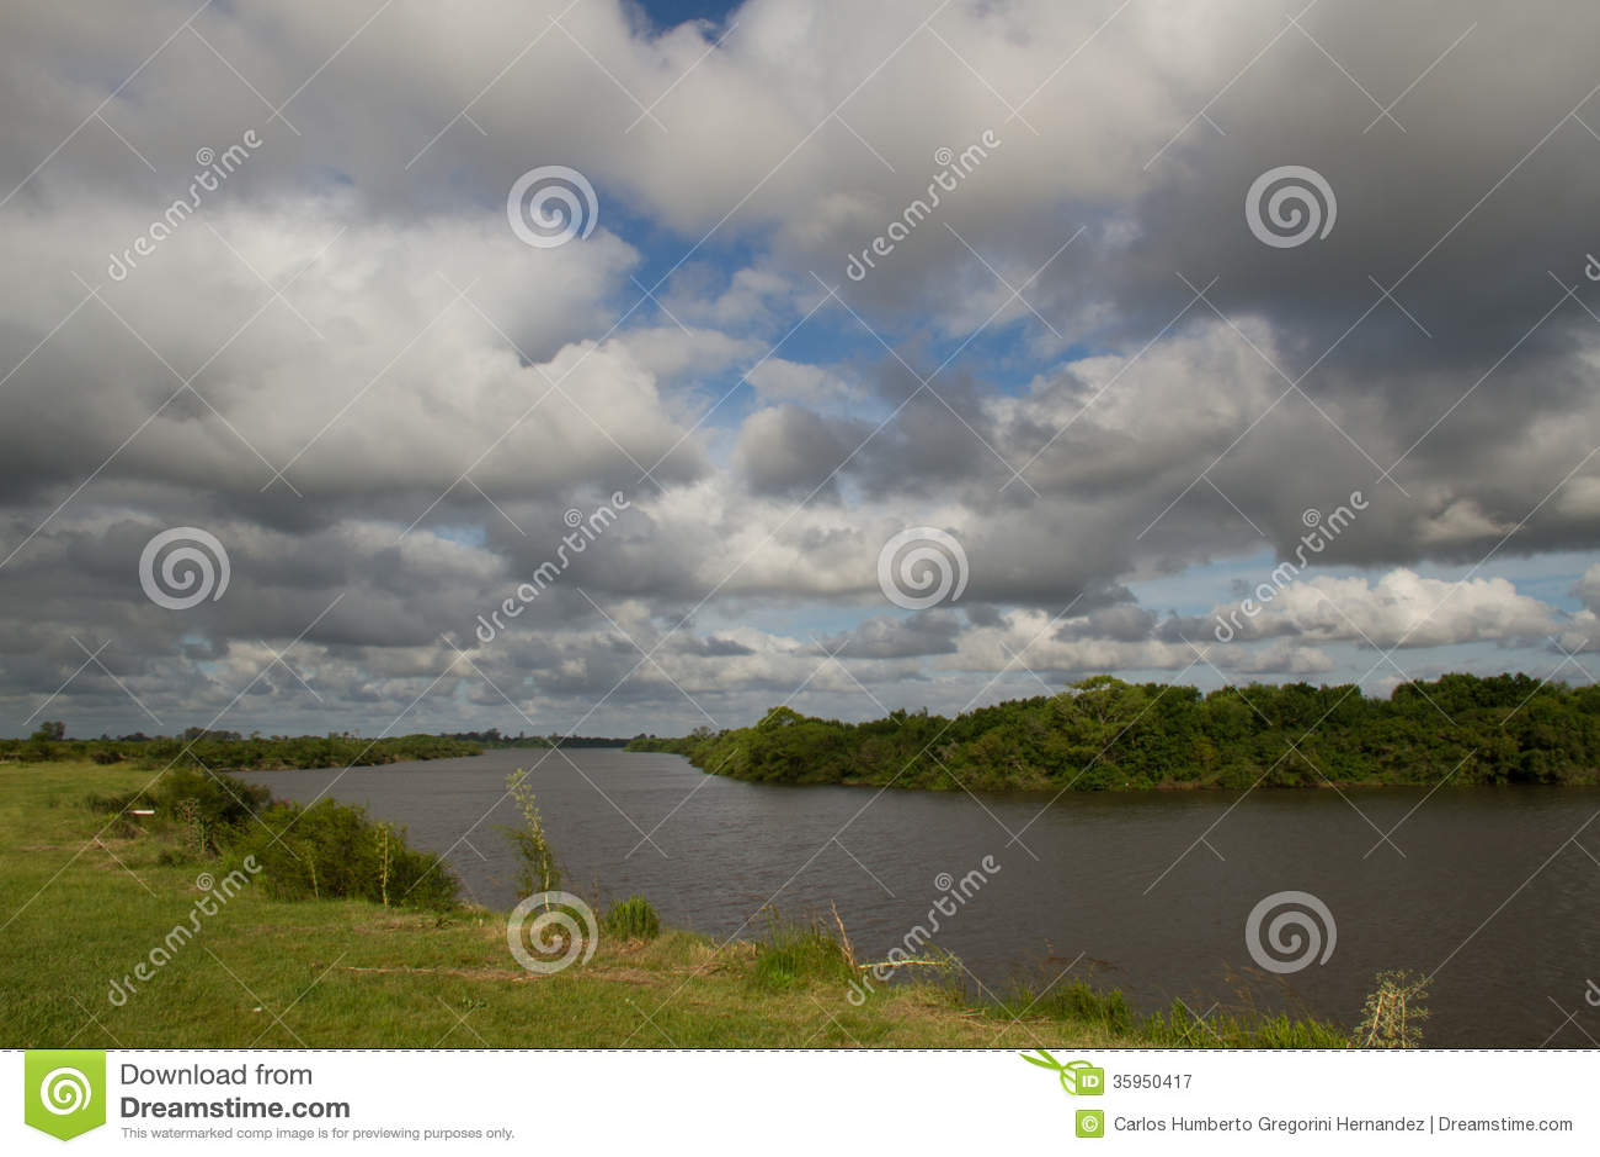 Río de Cebollatí